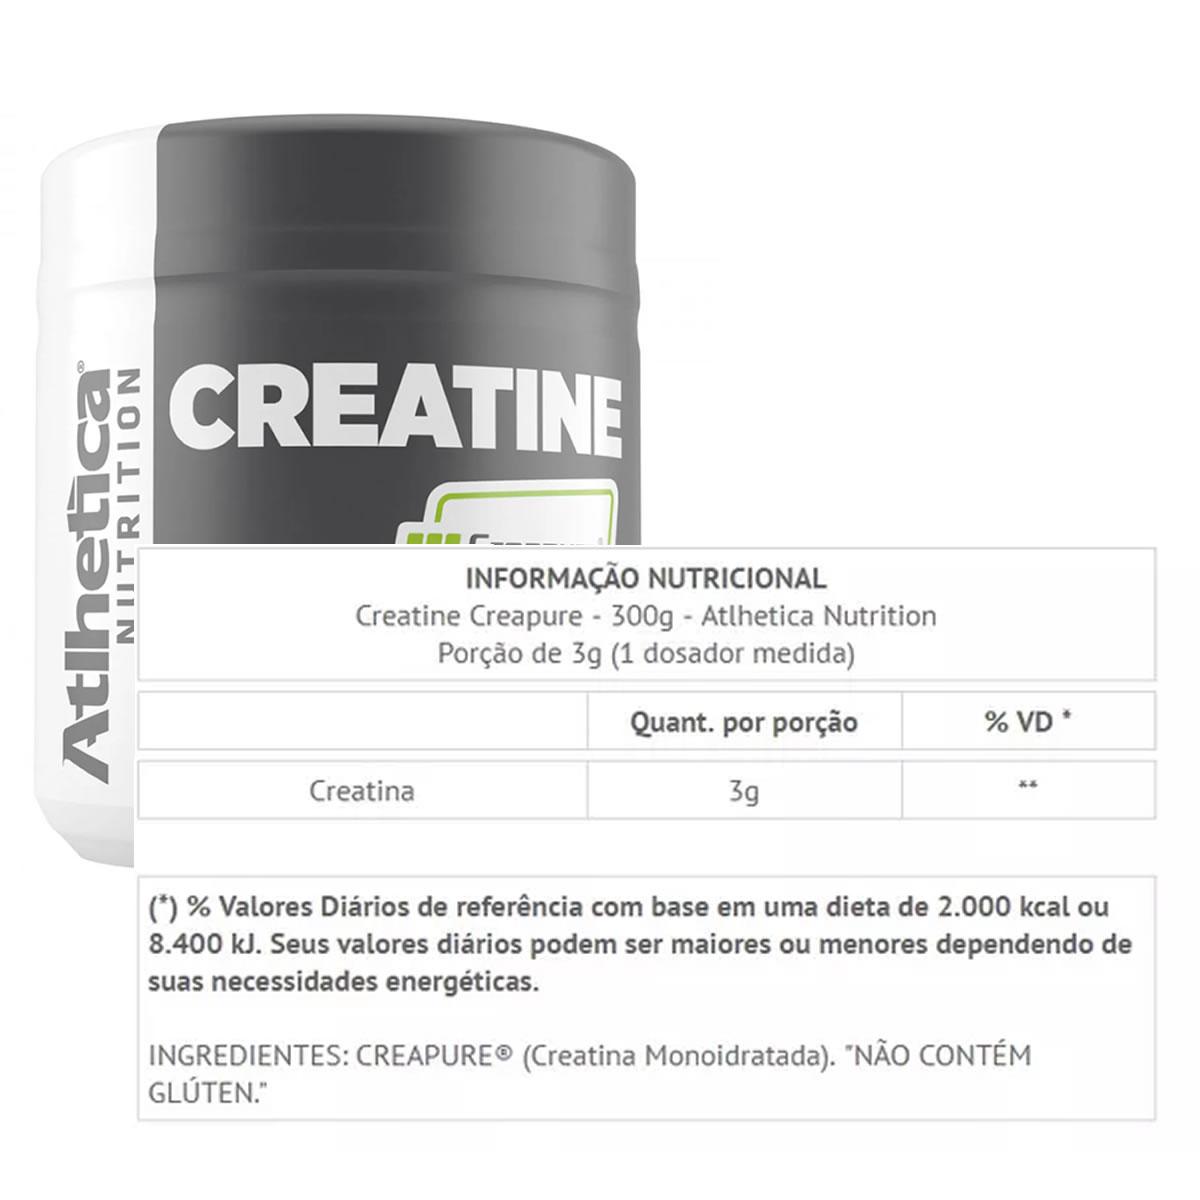 Creatine Creapure - 300g - Atlhetica